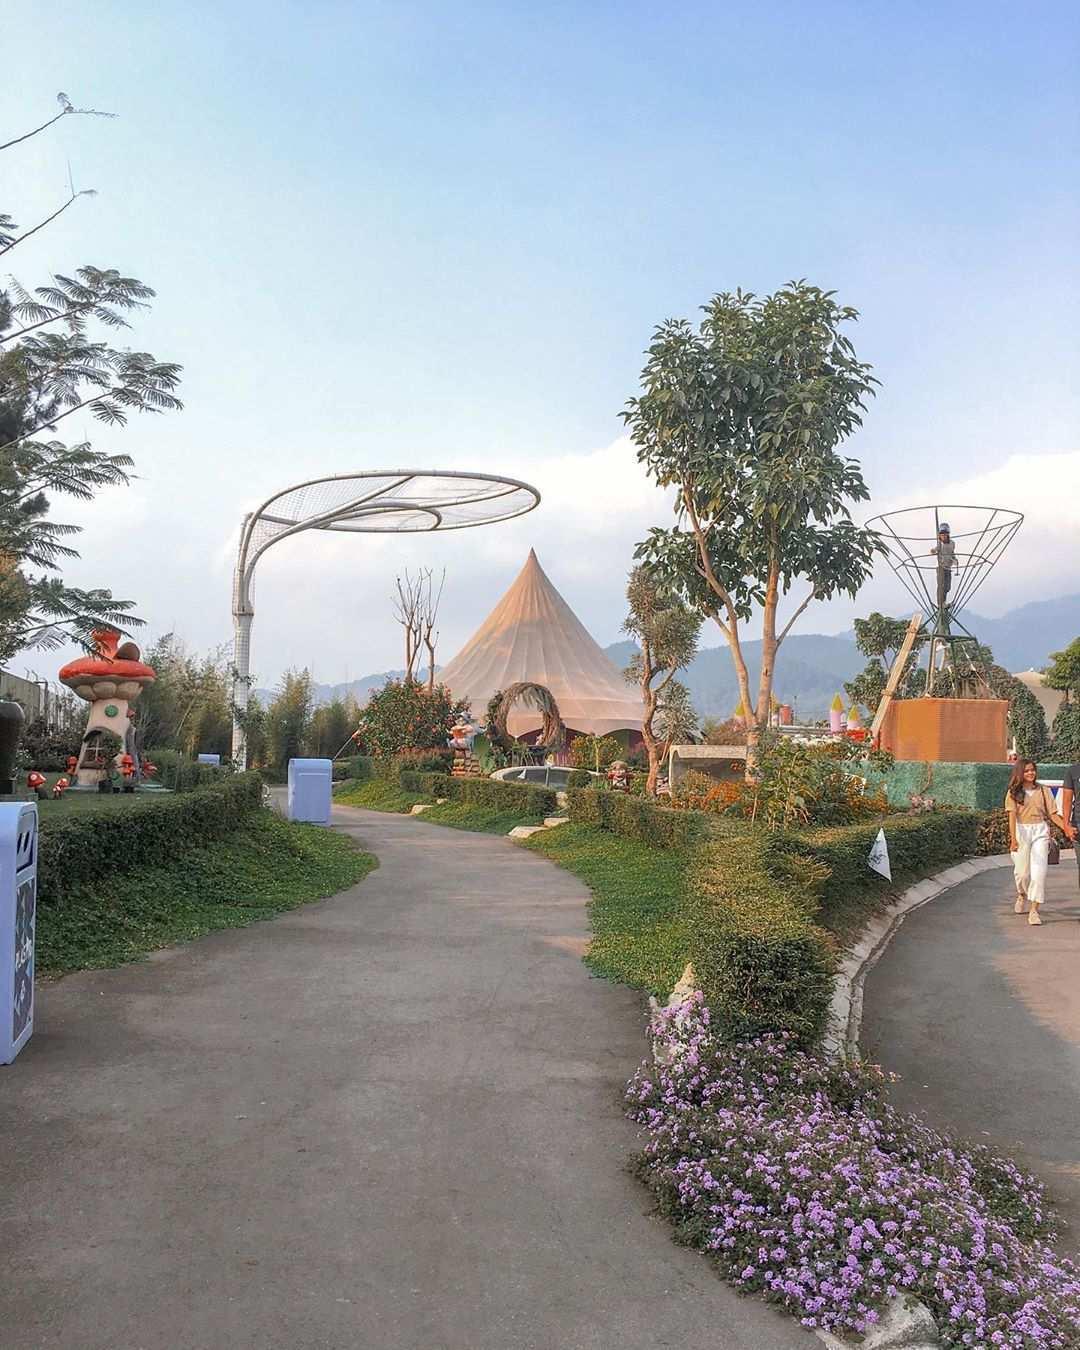 Suasana Jalanan di Fairy Garden Bandung, Image From @_hellonovi